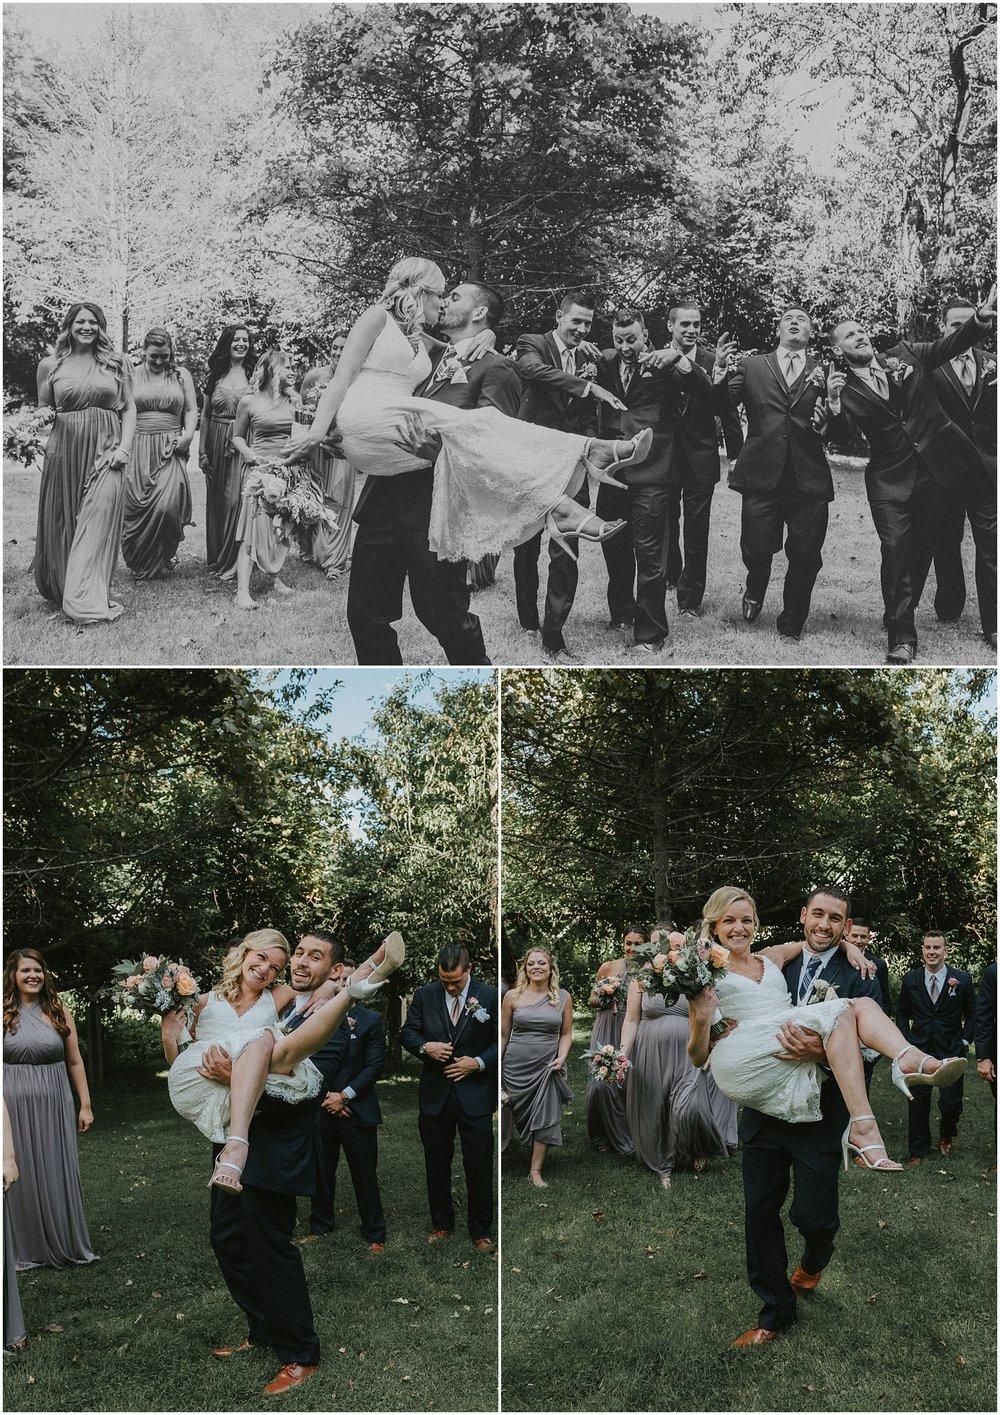 waterloo-village-waterloo village-wedding-outdoor wedding-rustic-boemian-new jersey-bride-groom-wedding party-davids bridal-wedding dress-wedding-first kiss-intimate wedding_0381.jpg